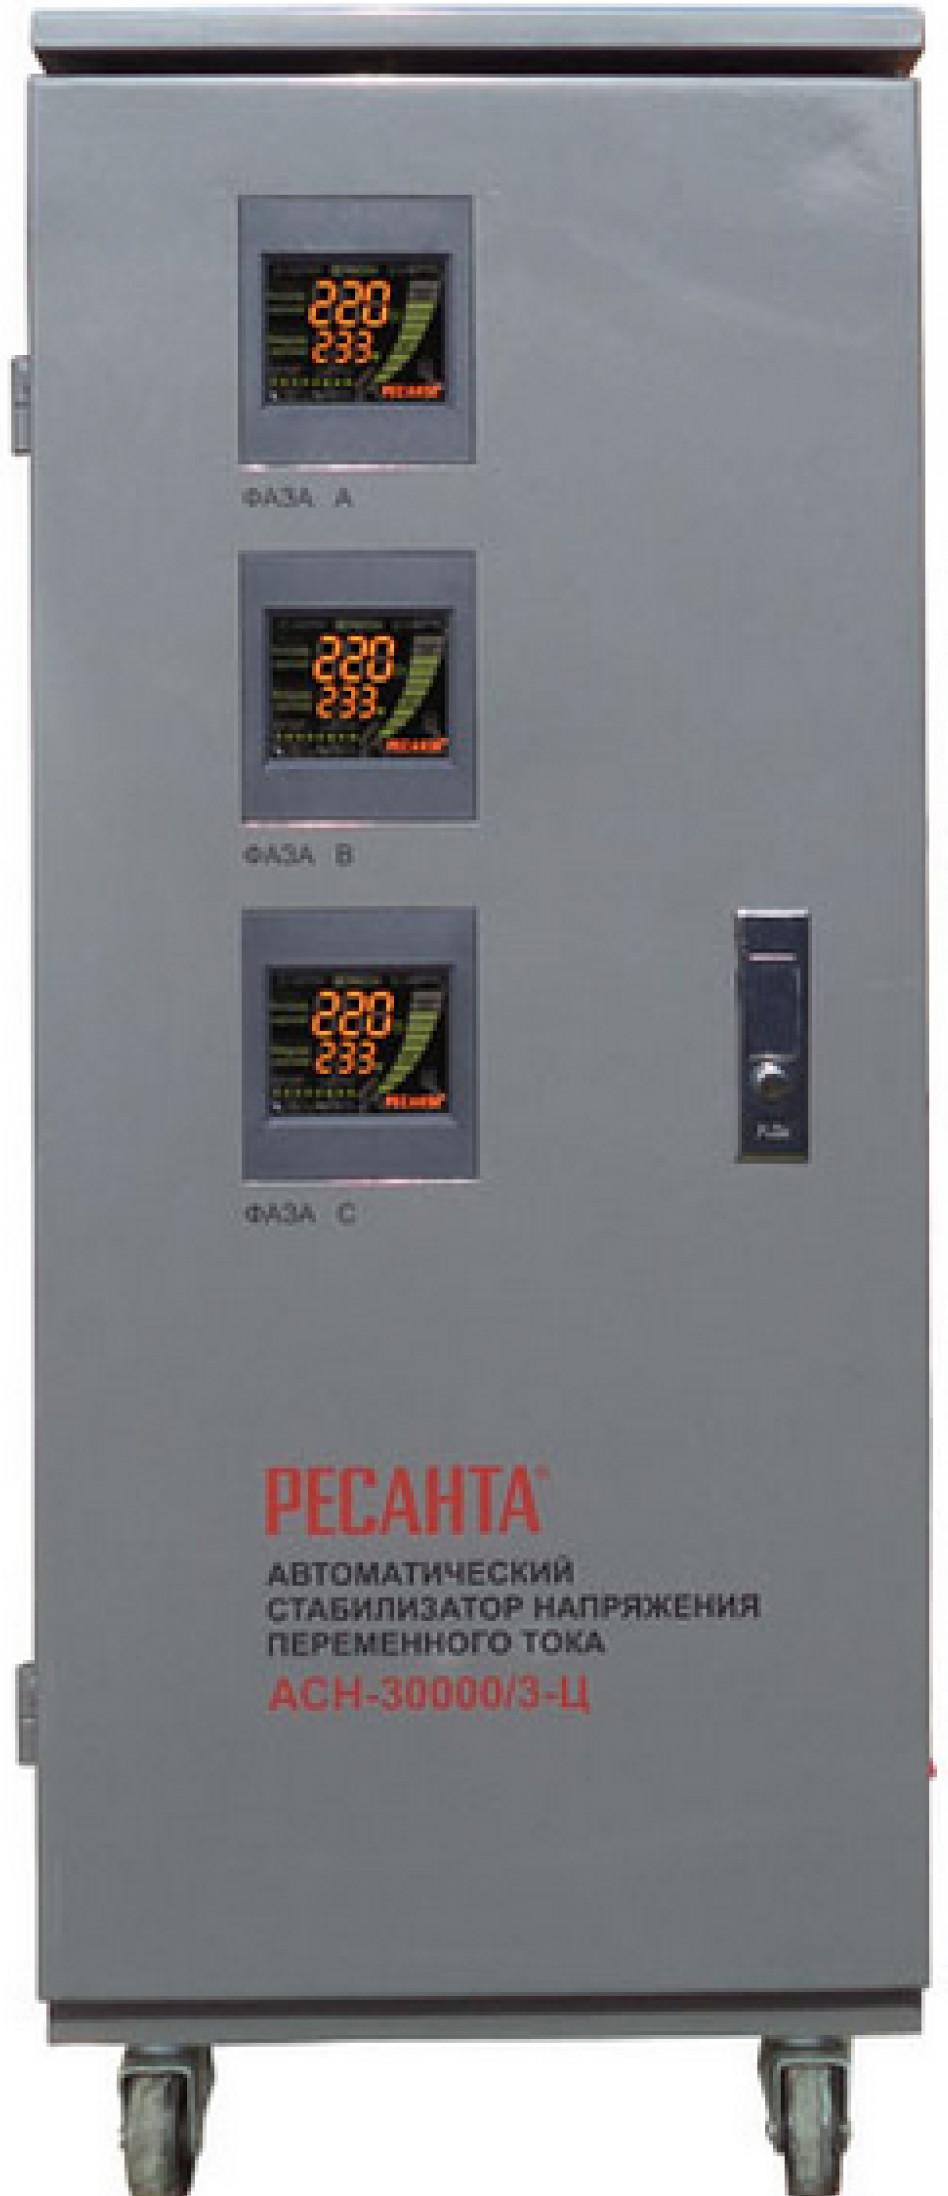 Стабилизатор напряжения Ресанта ACH-30000/3-Ц